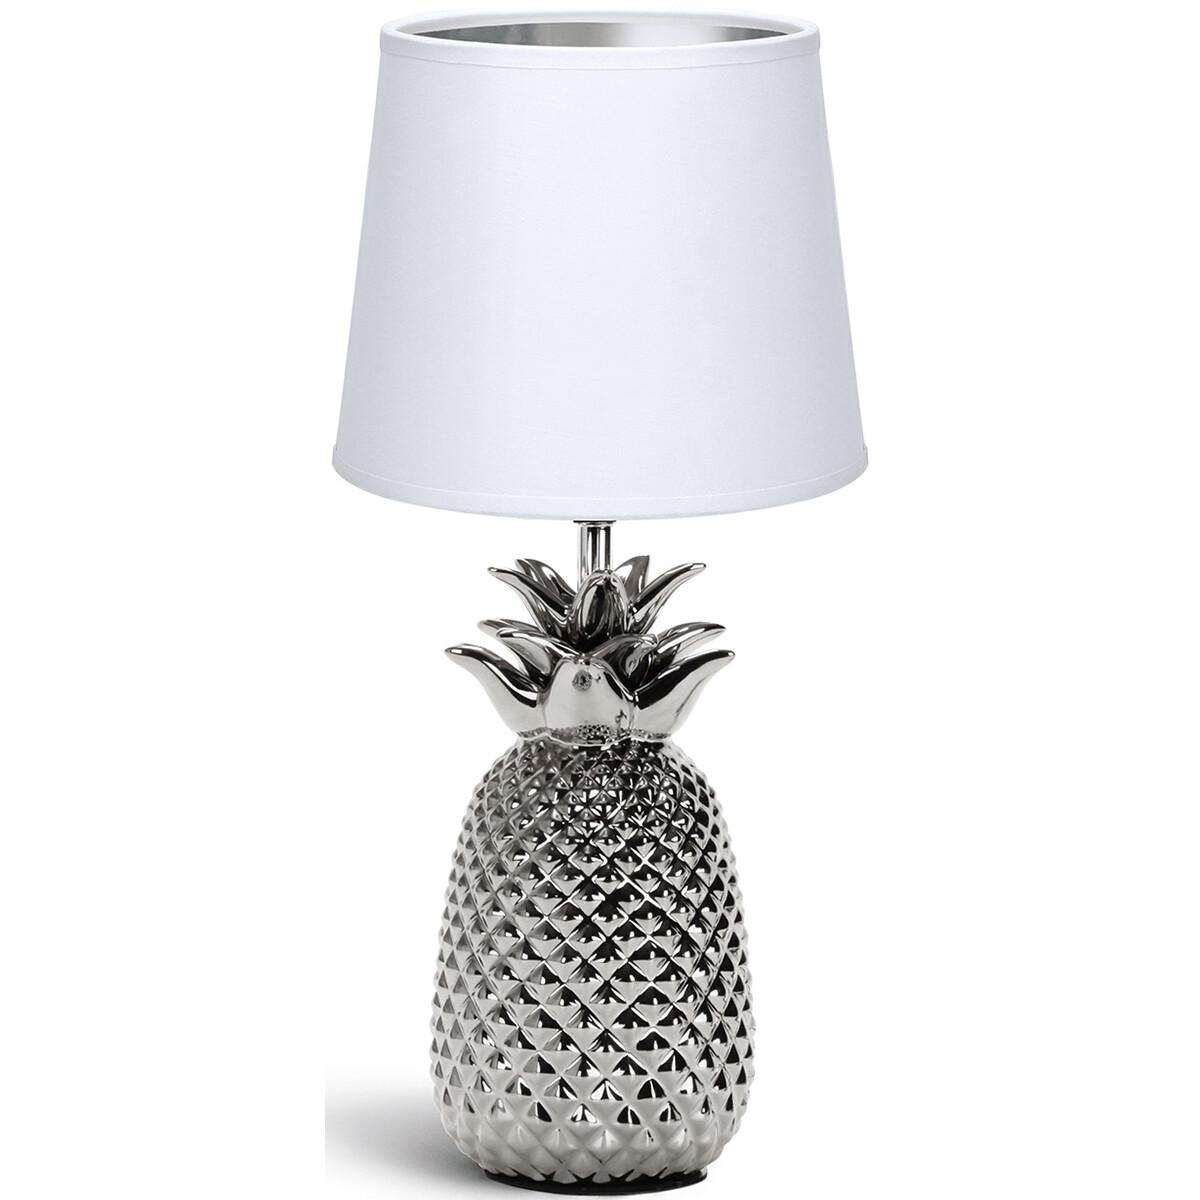 LED Tafellamp - Tafelverlichting - Aigi Winkon - E14 Fitting - Rond - Mat Wit/Zilver - Keramiek